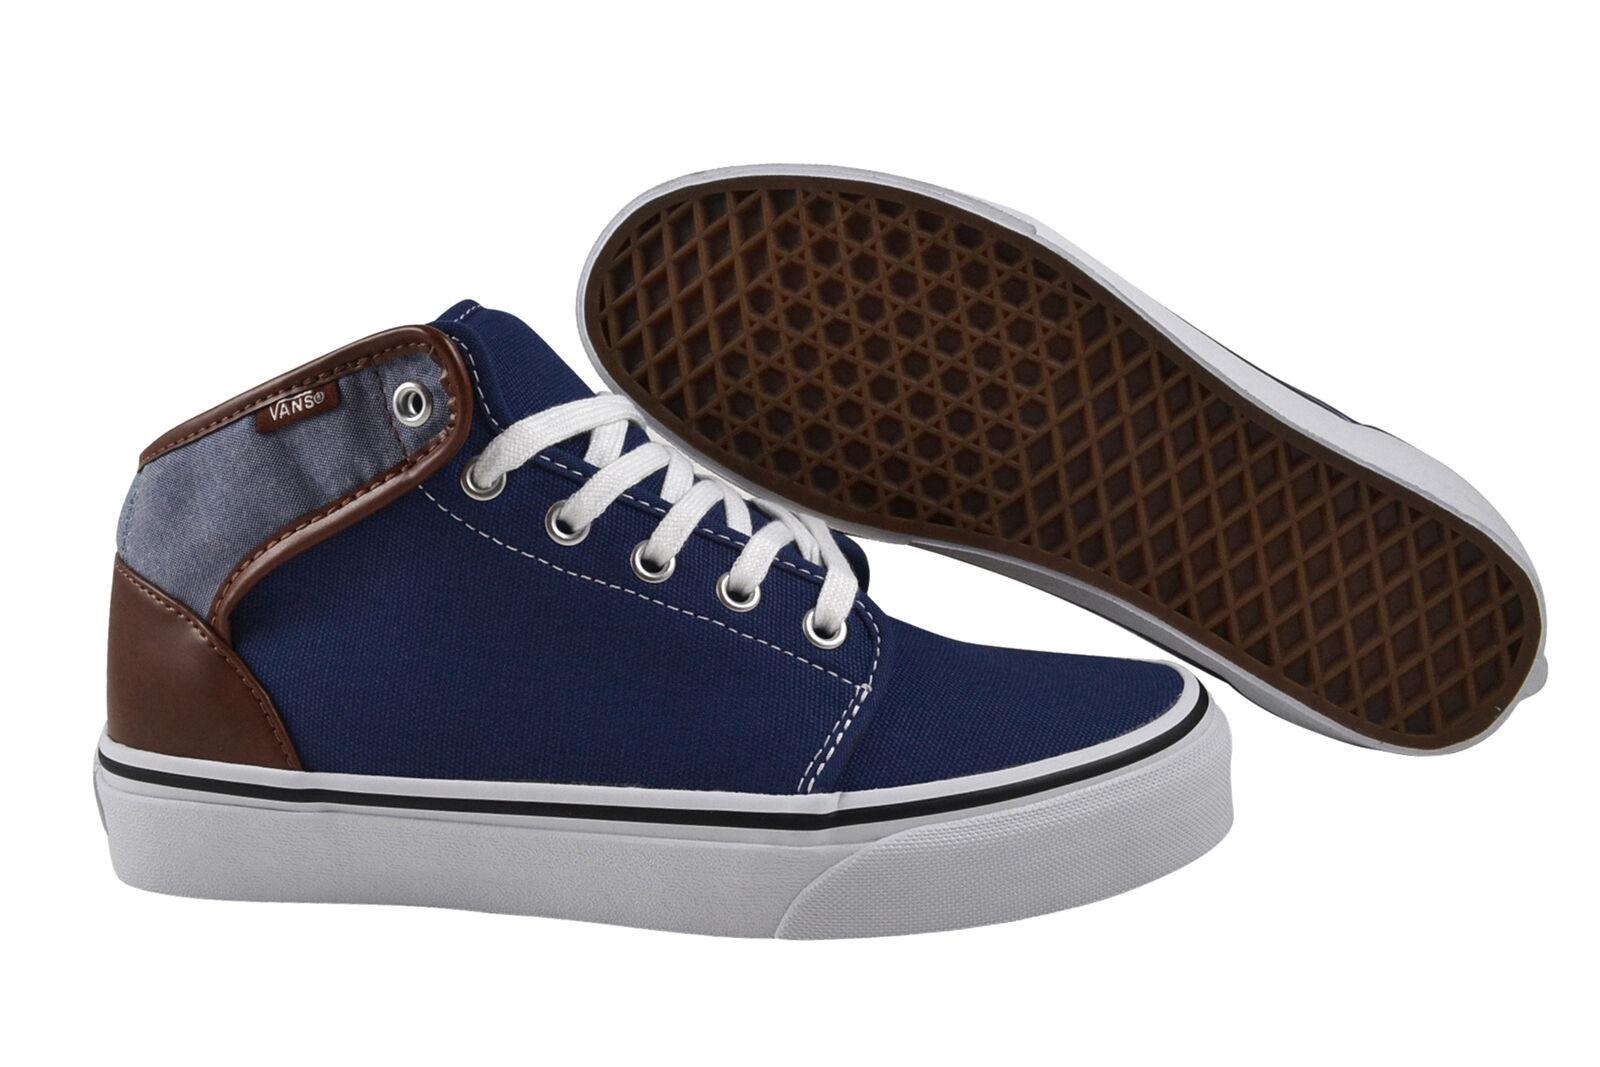 Vans 106 mid canvas & Chambray Estat Sneaker/zapatos ucqat 6 azul